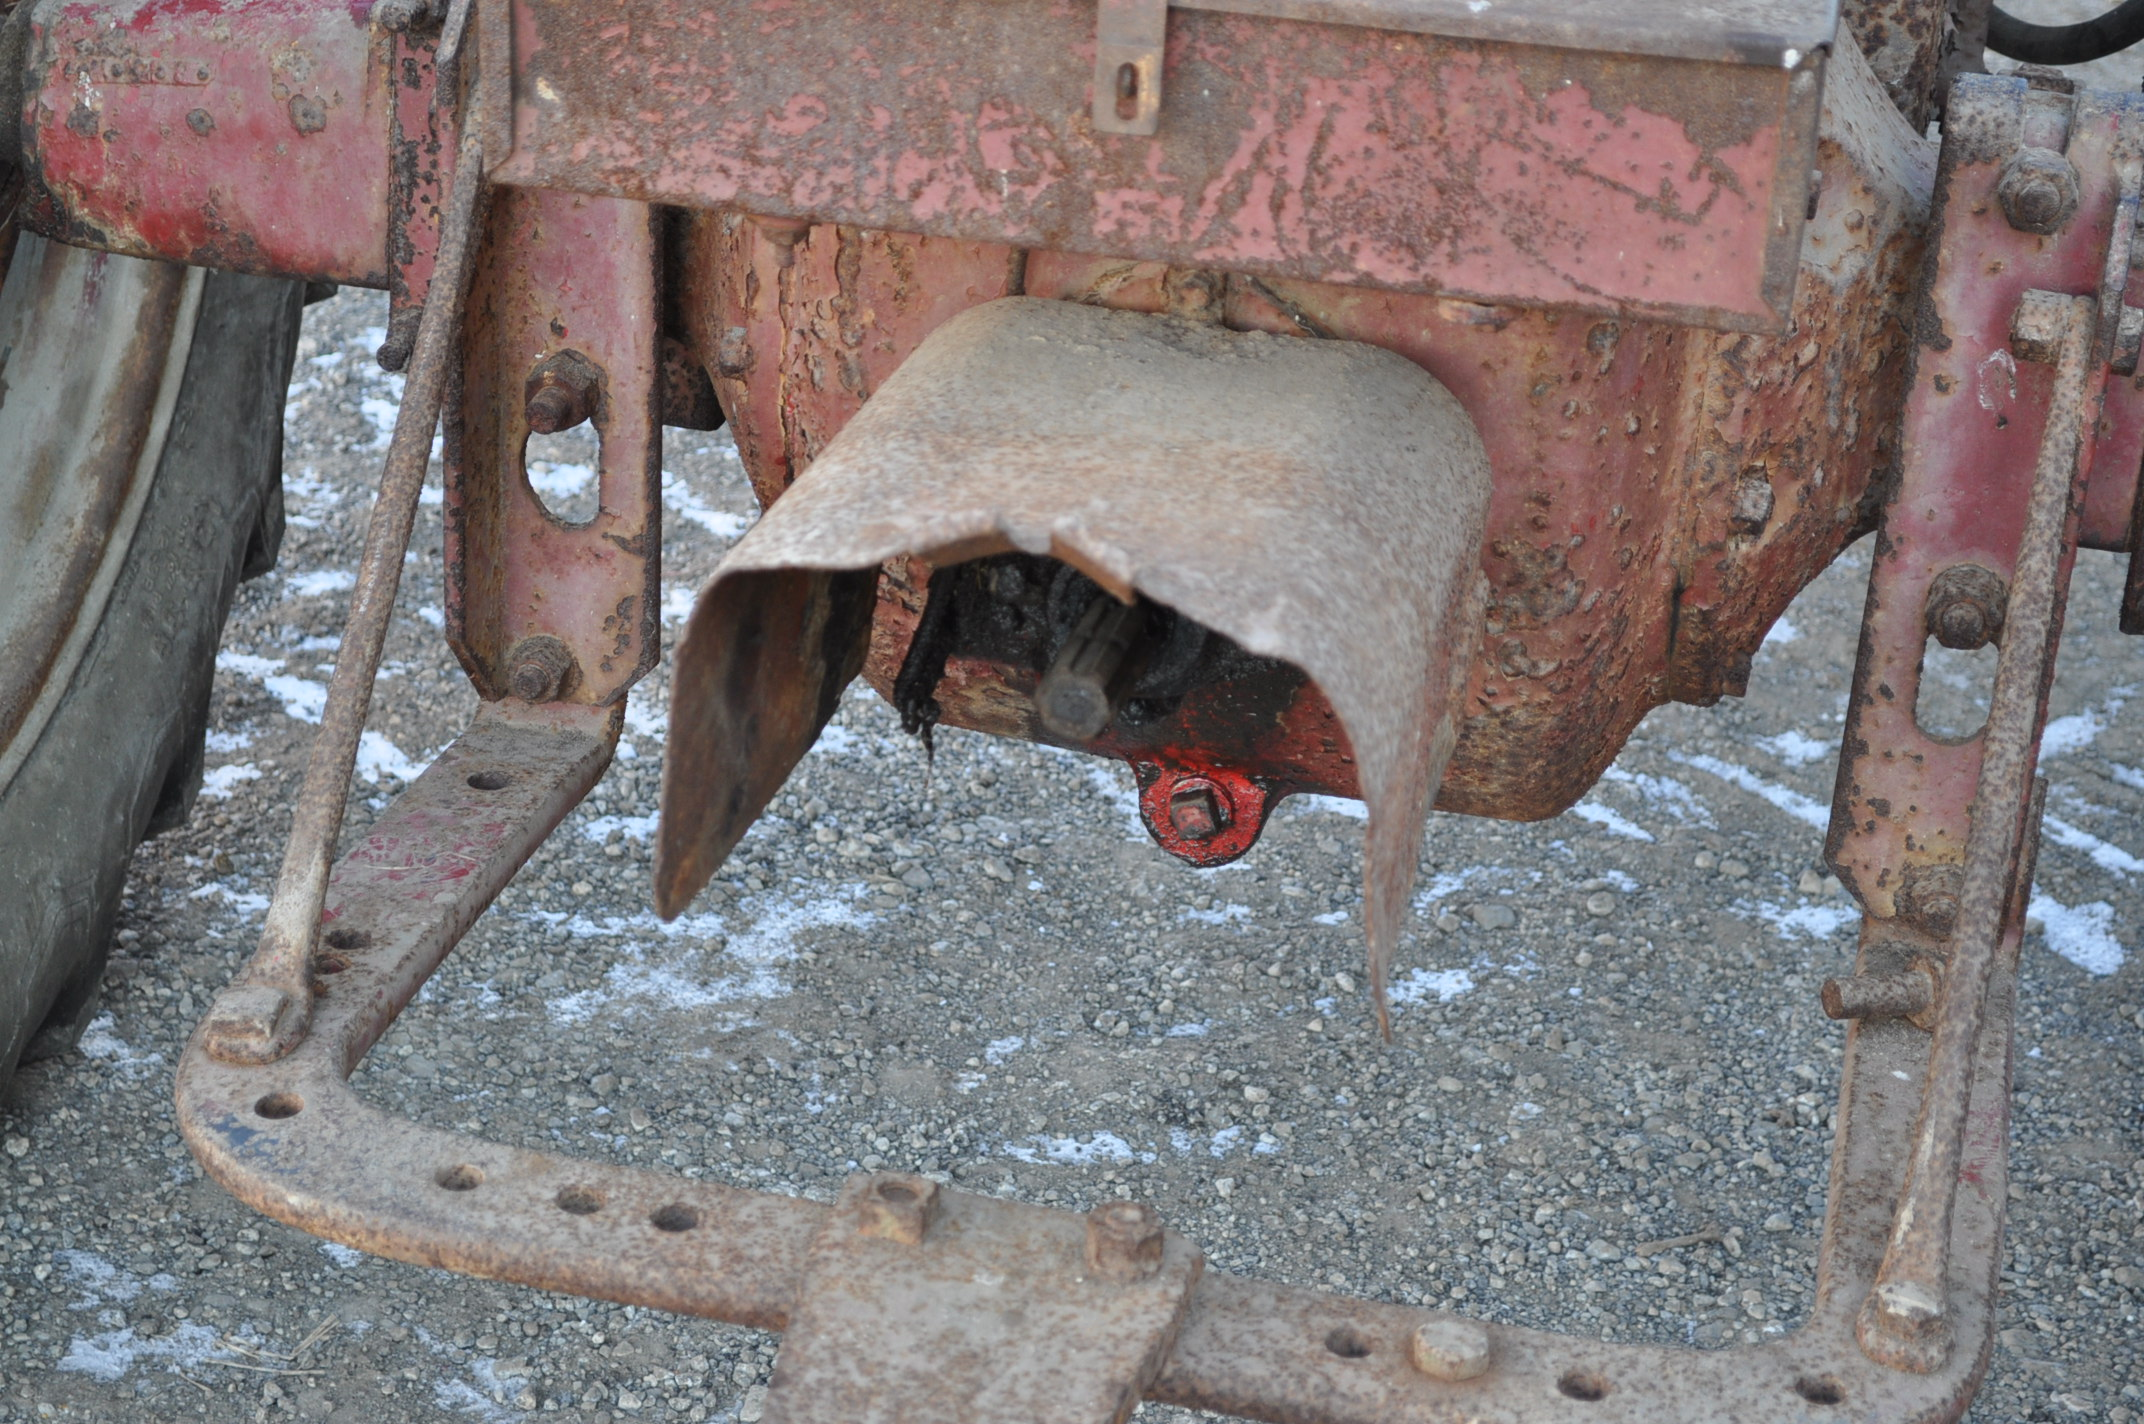 Farmall M tractor, 13.6-38 rear, narrow front, gasoline, loader, 540 PTO, SN FBK276 - Image 8 of 11